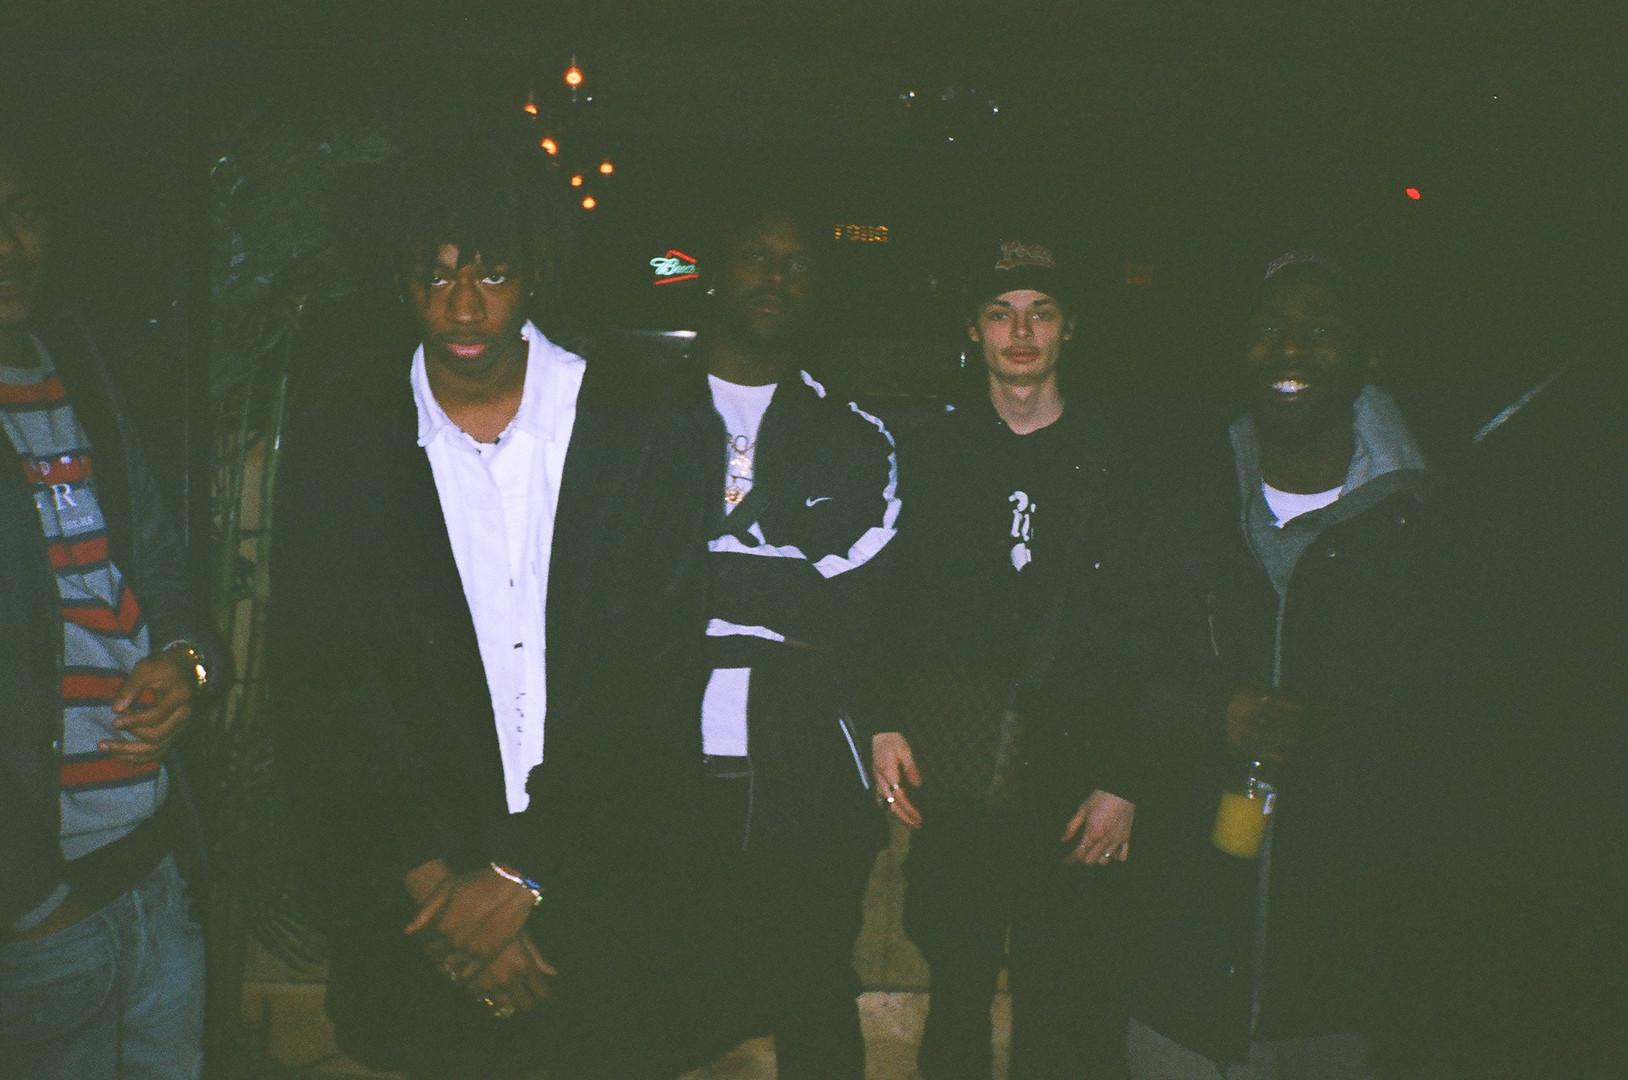 GROUP 01